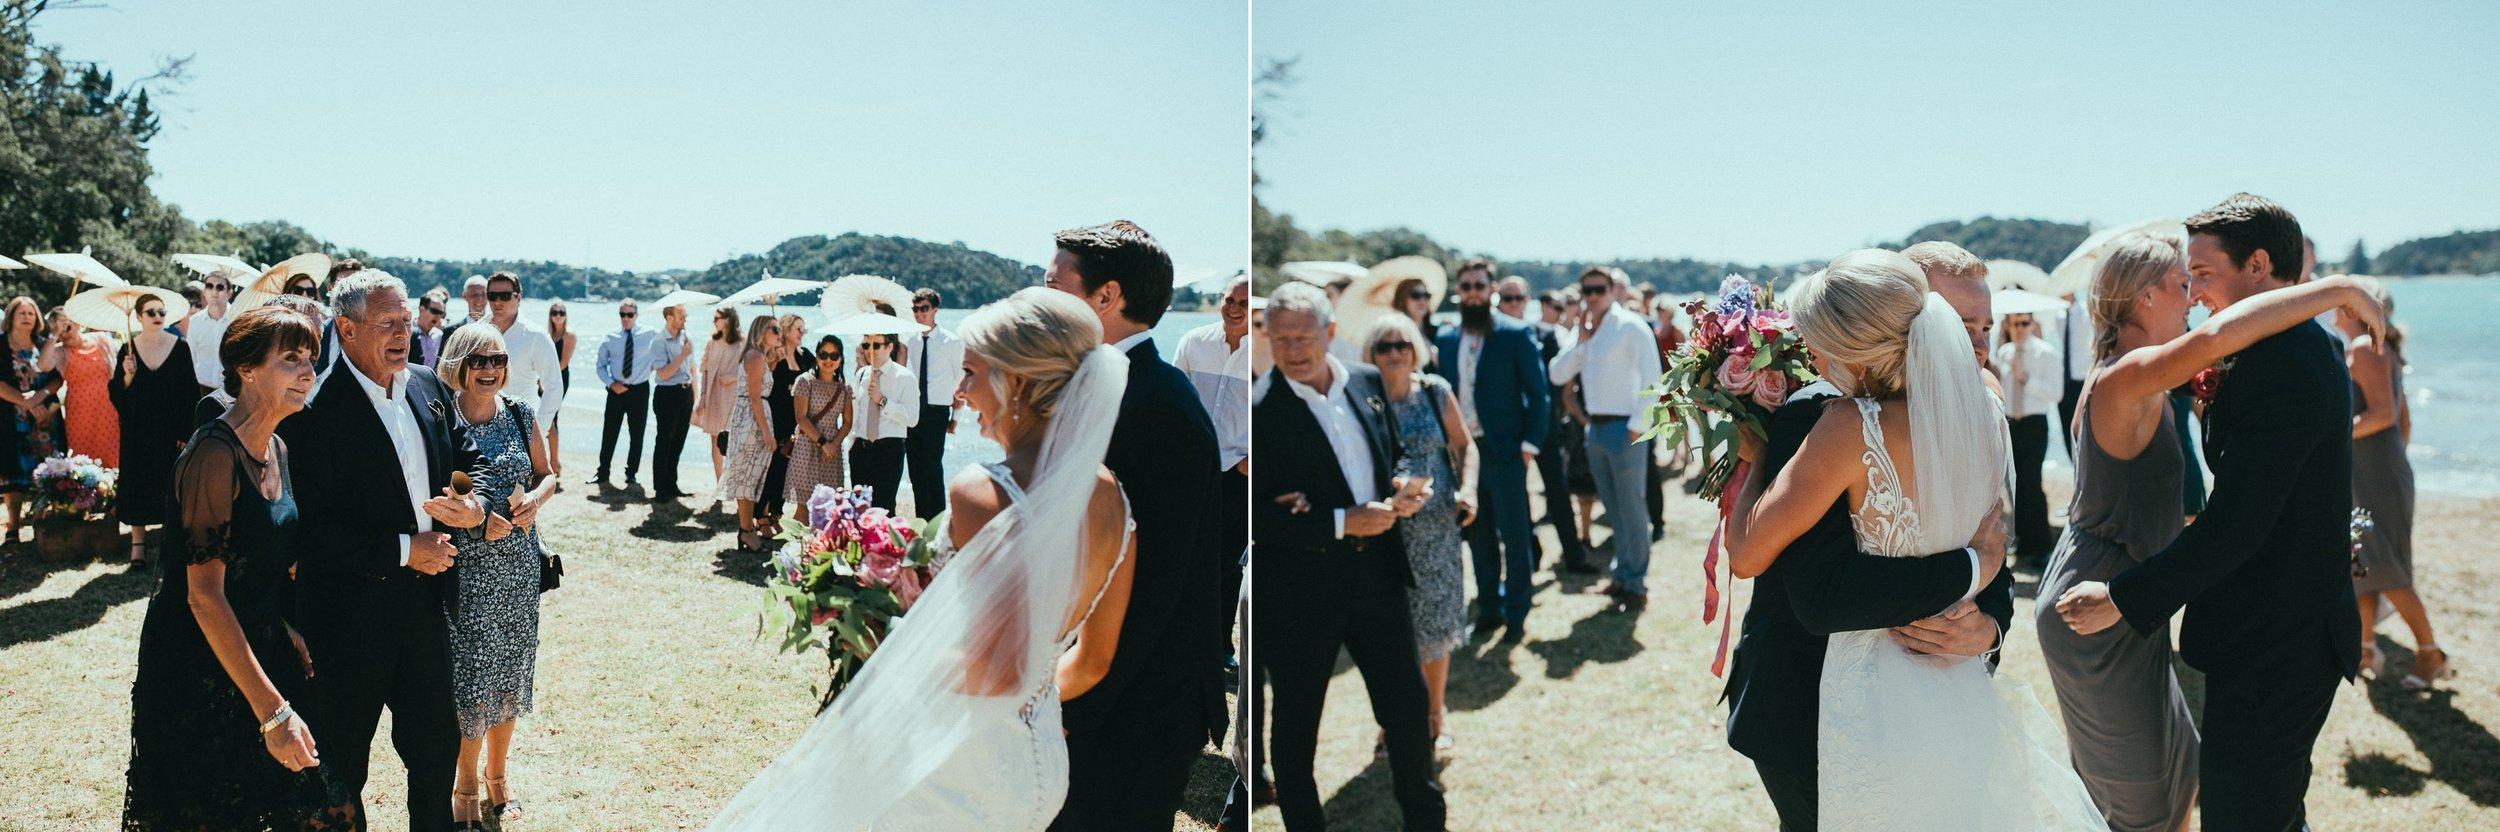 new-zealand-wedding-auckland (57).jpg